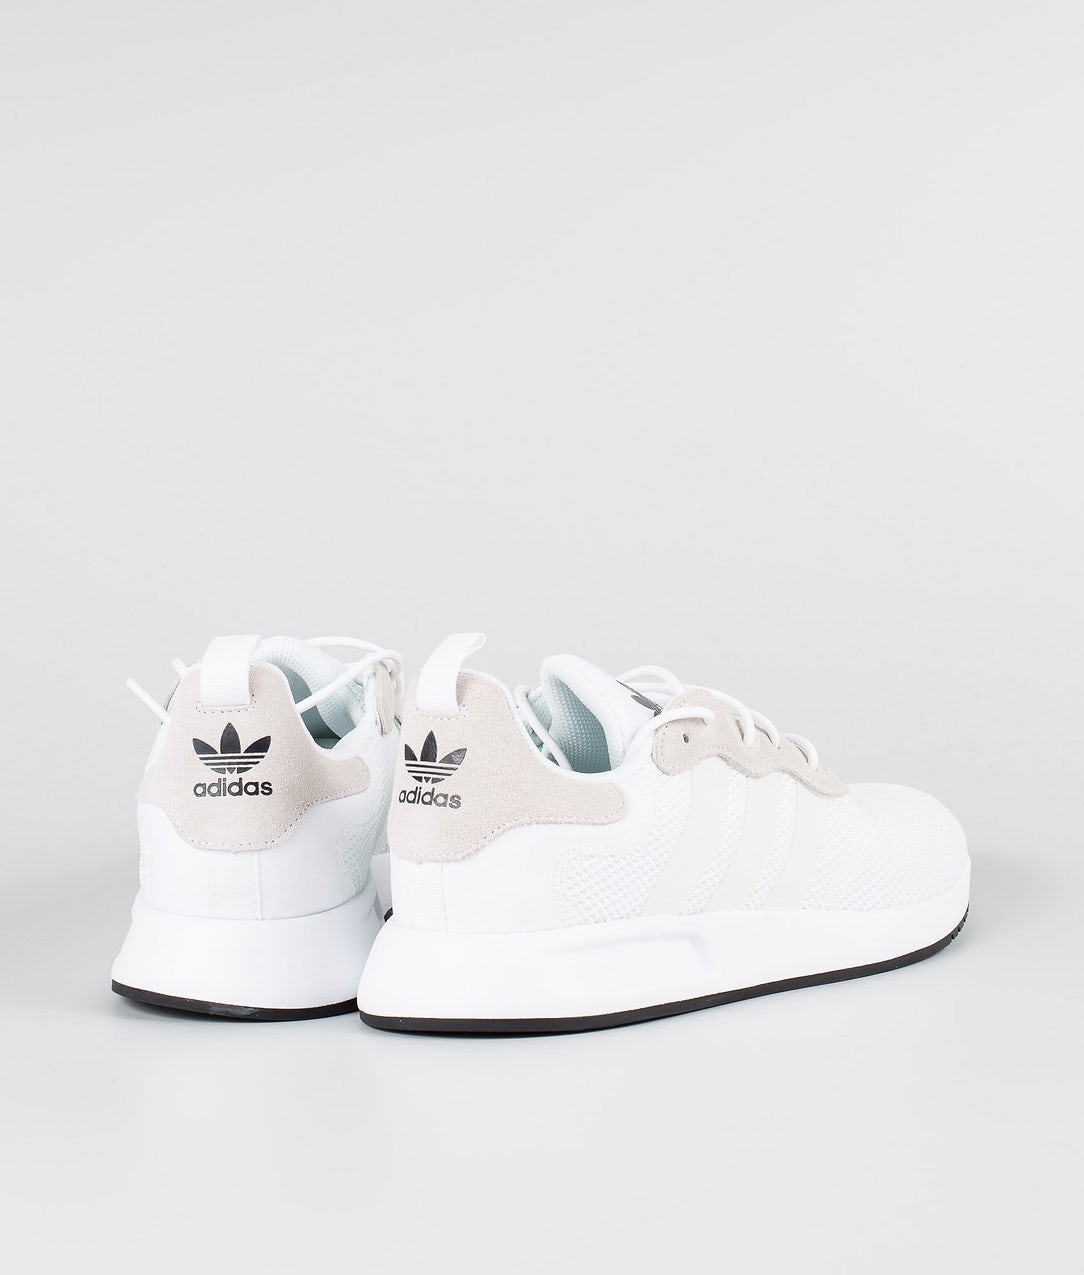 Adidas Originals X_Plr S Shoes Footwear White/Footwear White/Core Black -  Ridestore.com